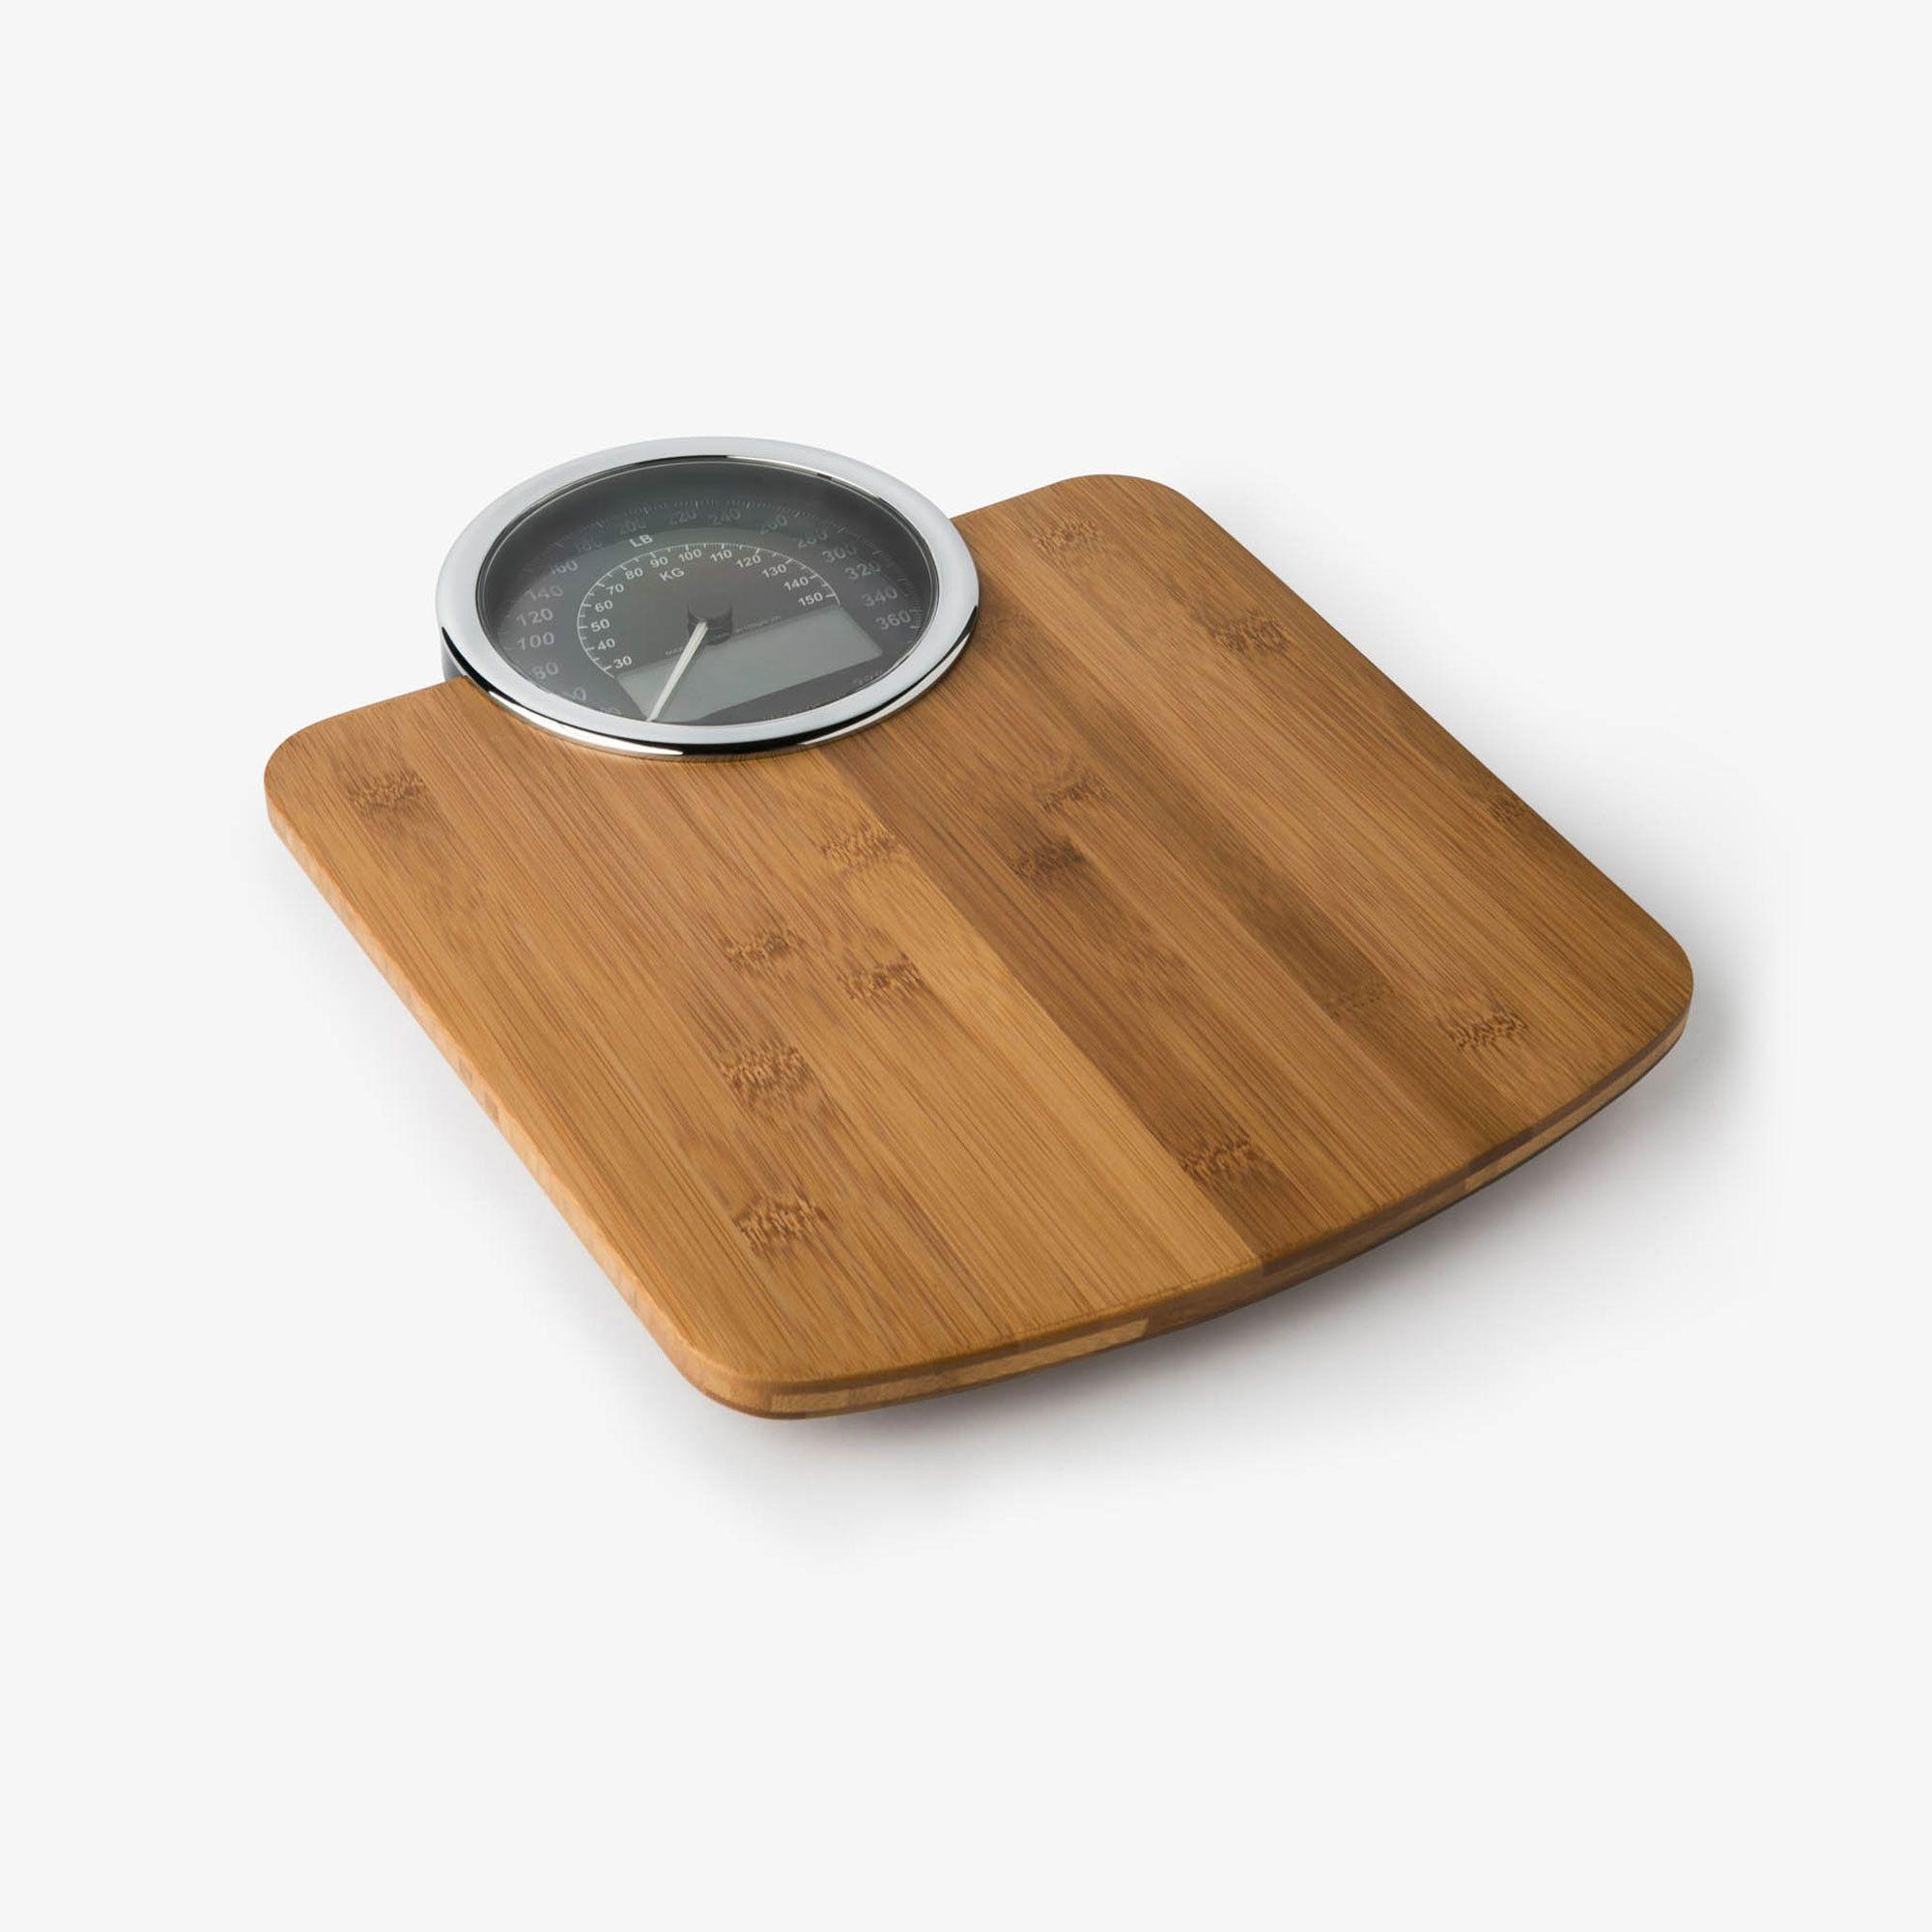 Balance2 Digital Body Scale, Bathroom Scale, - Vanity Planet